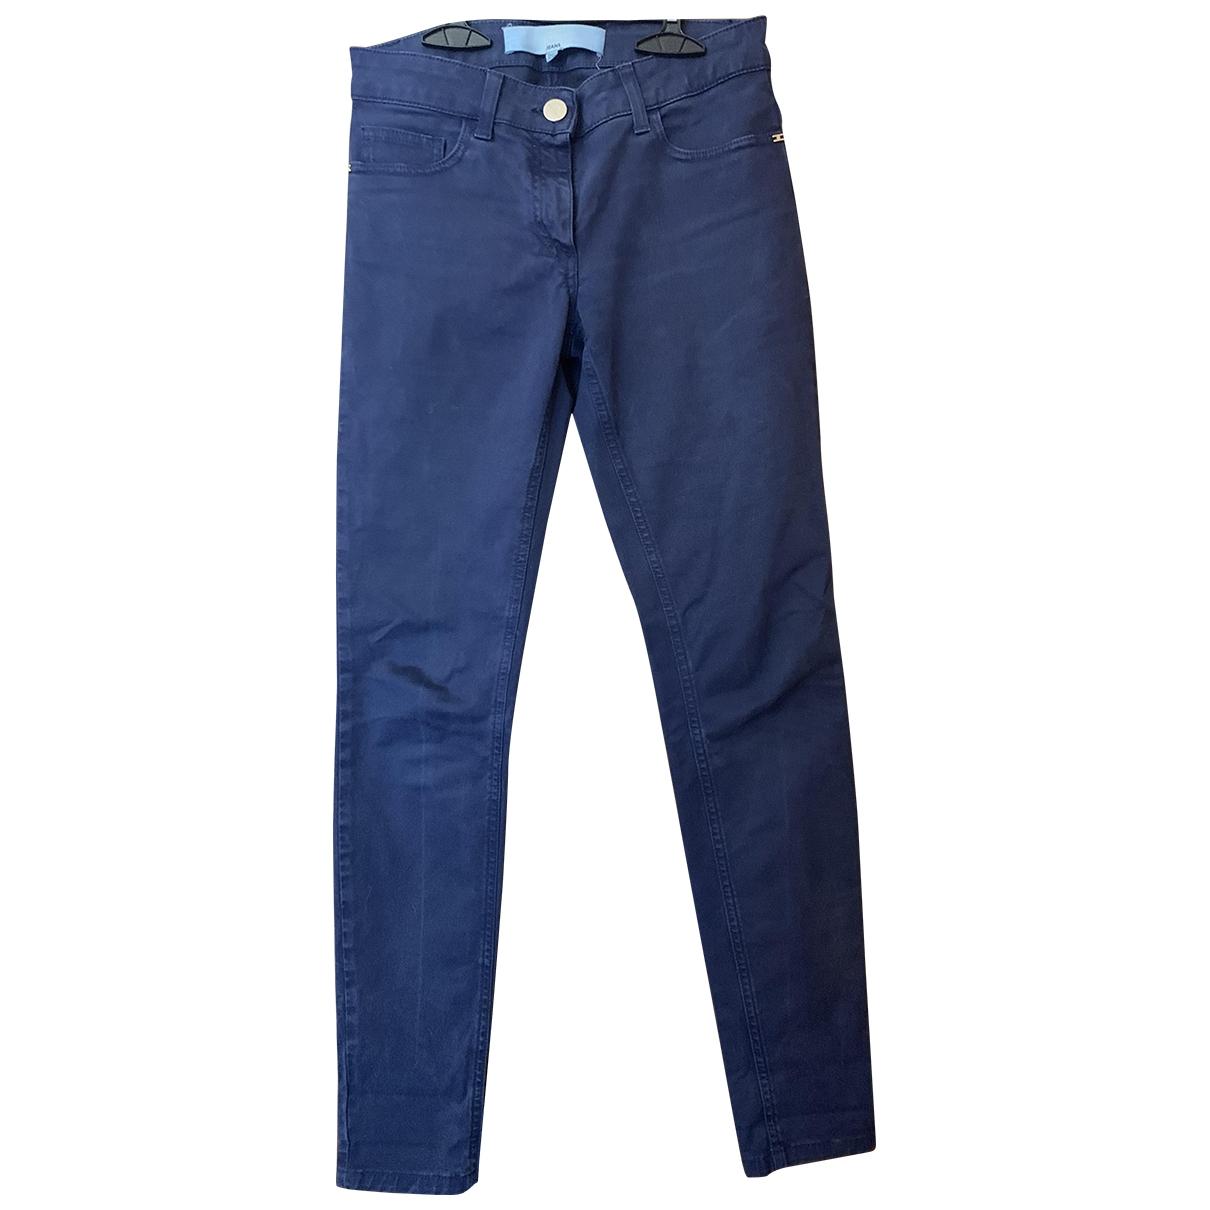 Elisabetta Franchi \N Blue Denim - Jeans Trousers for Women 40 IT